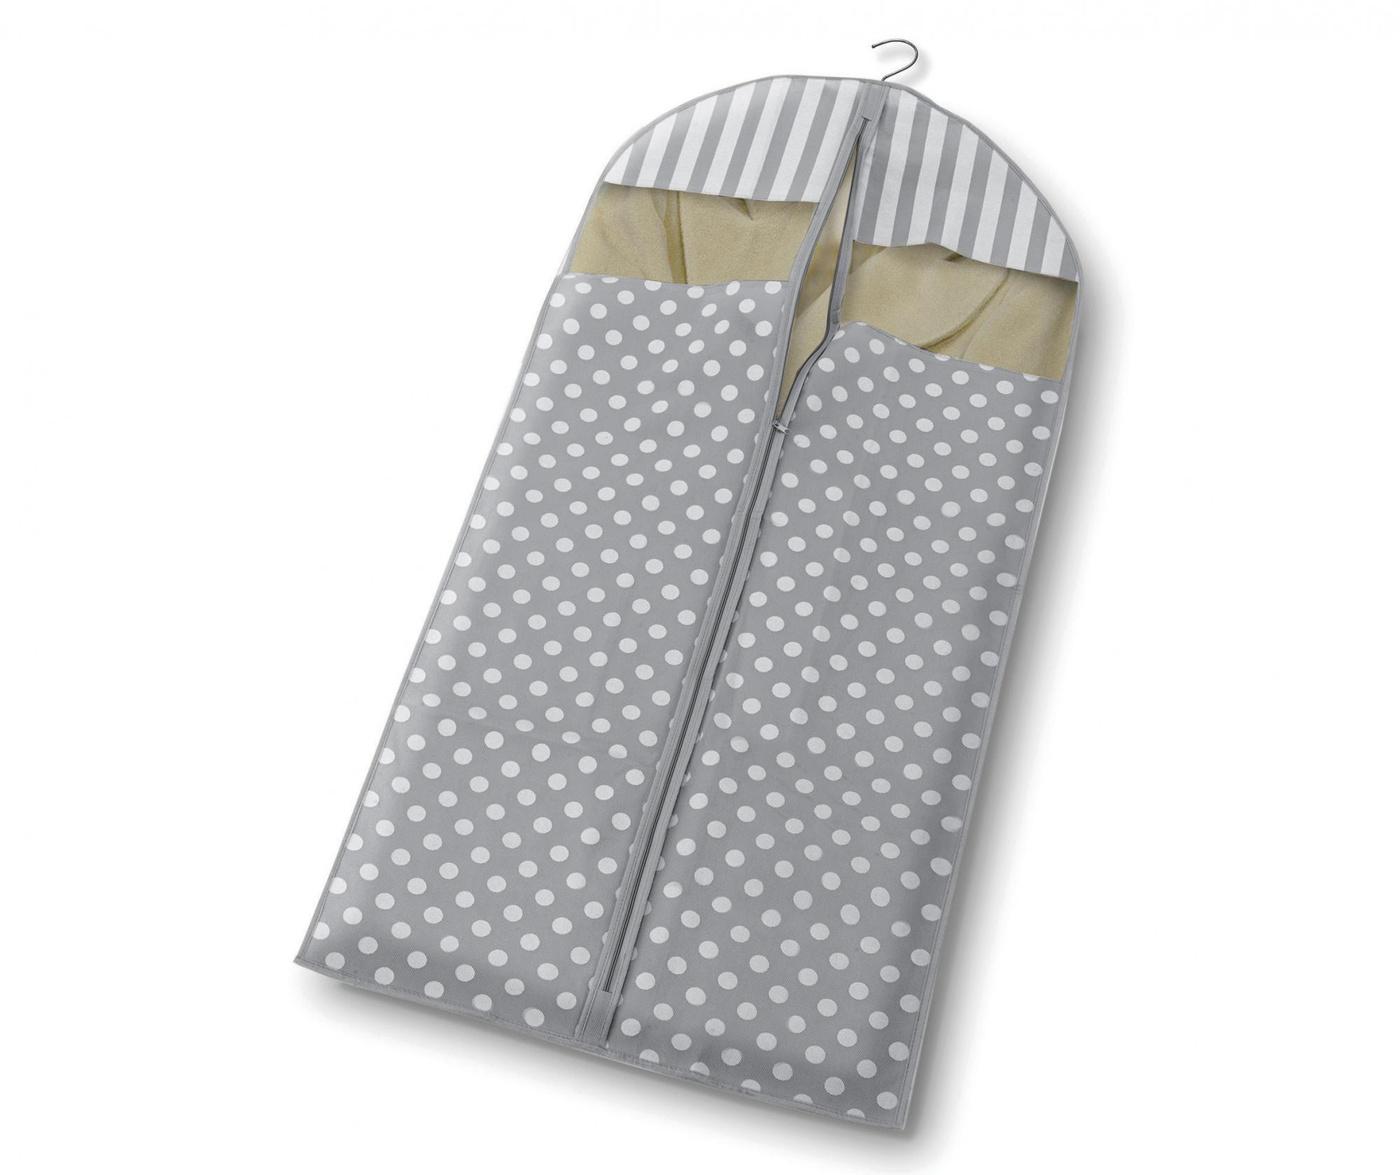 Husa pentru haine Lines&Dots 60x137 cm